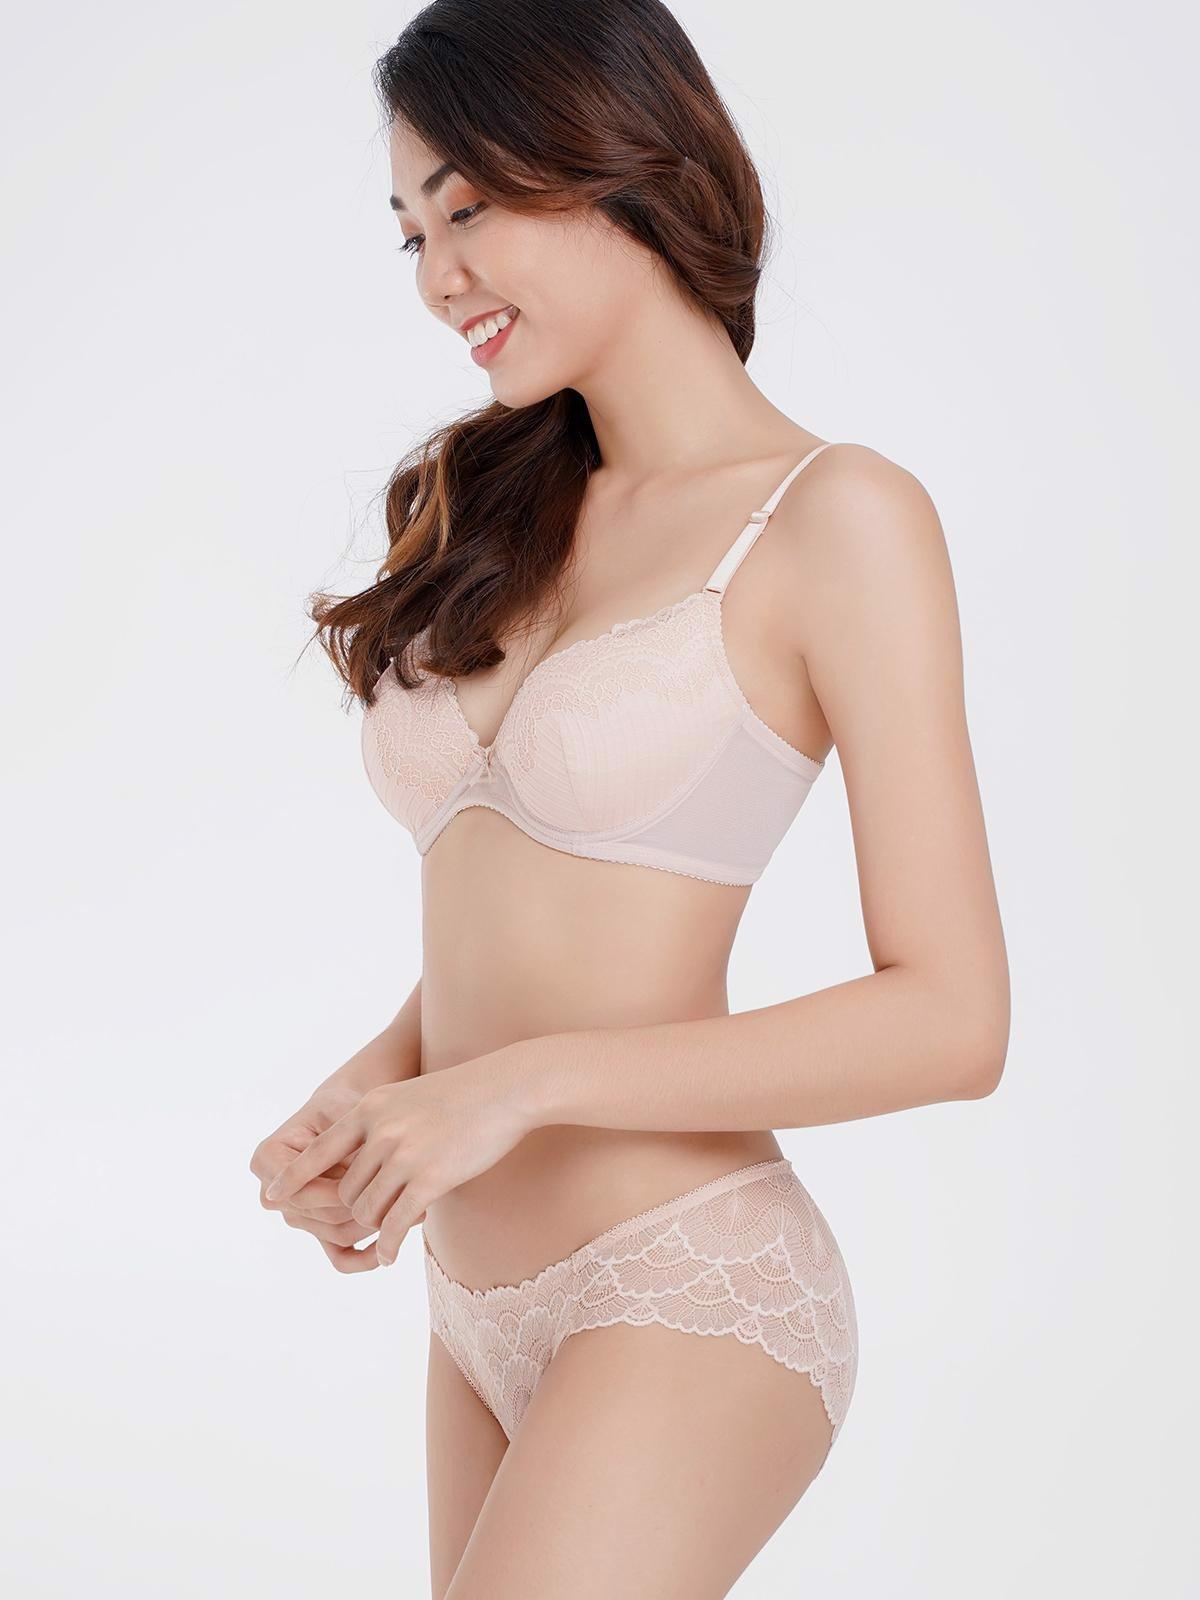 Quần lót Misaki ren gợi cảm - 9108